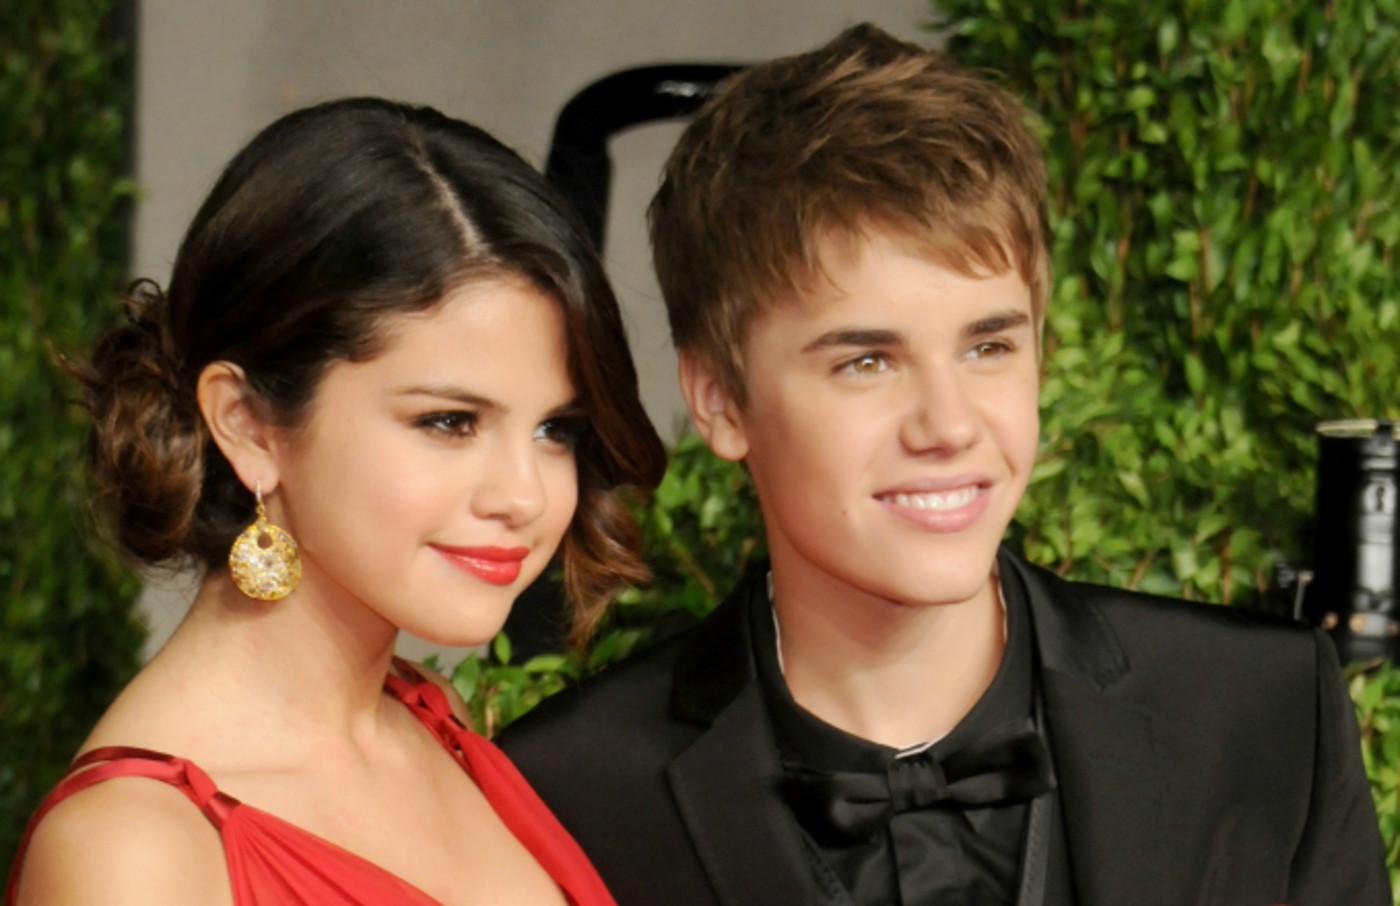 Someone Hacked Selena Gomez Instagram, Shared Nude Justin